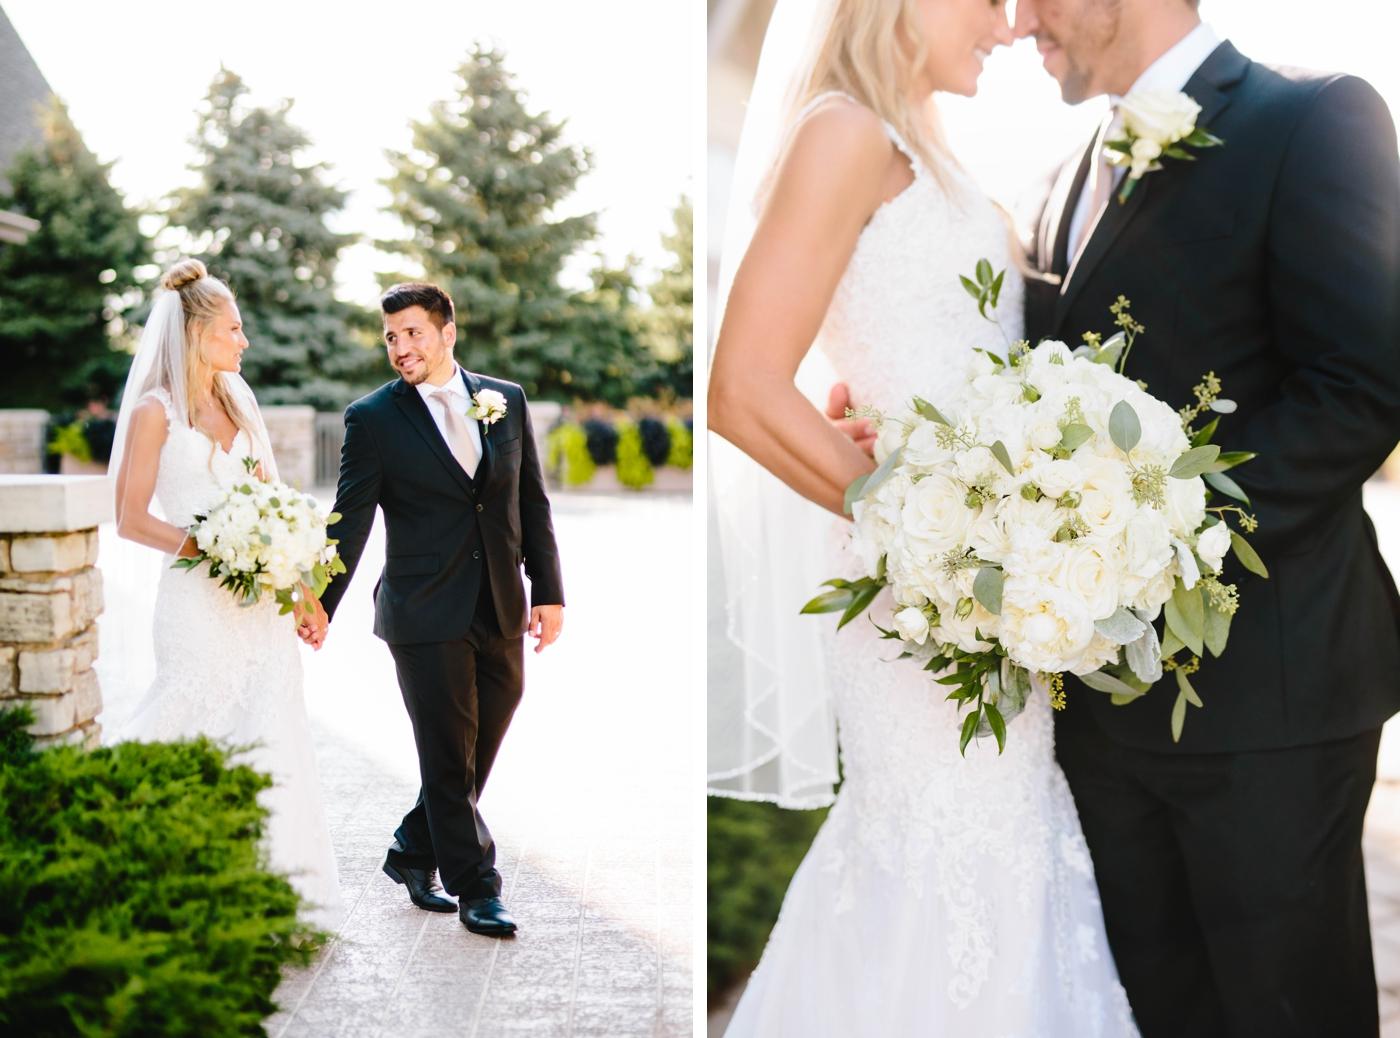 chicago-fine-art-wedding-photography-patano29